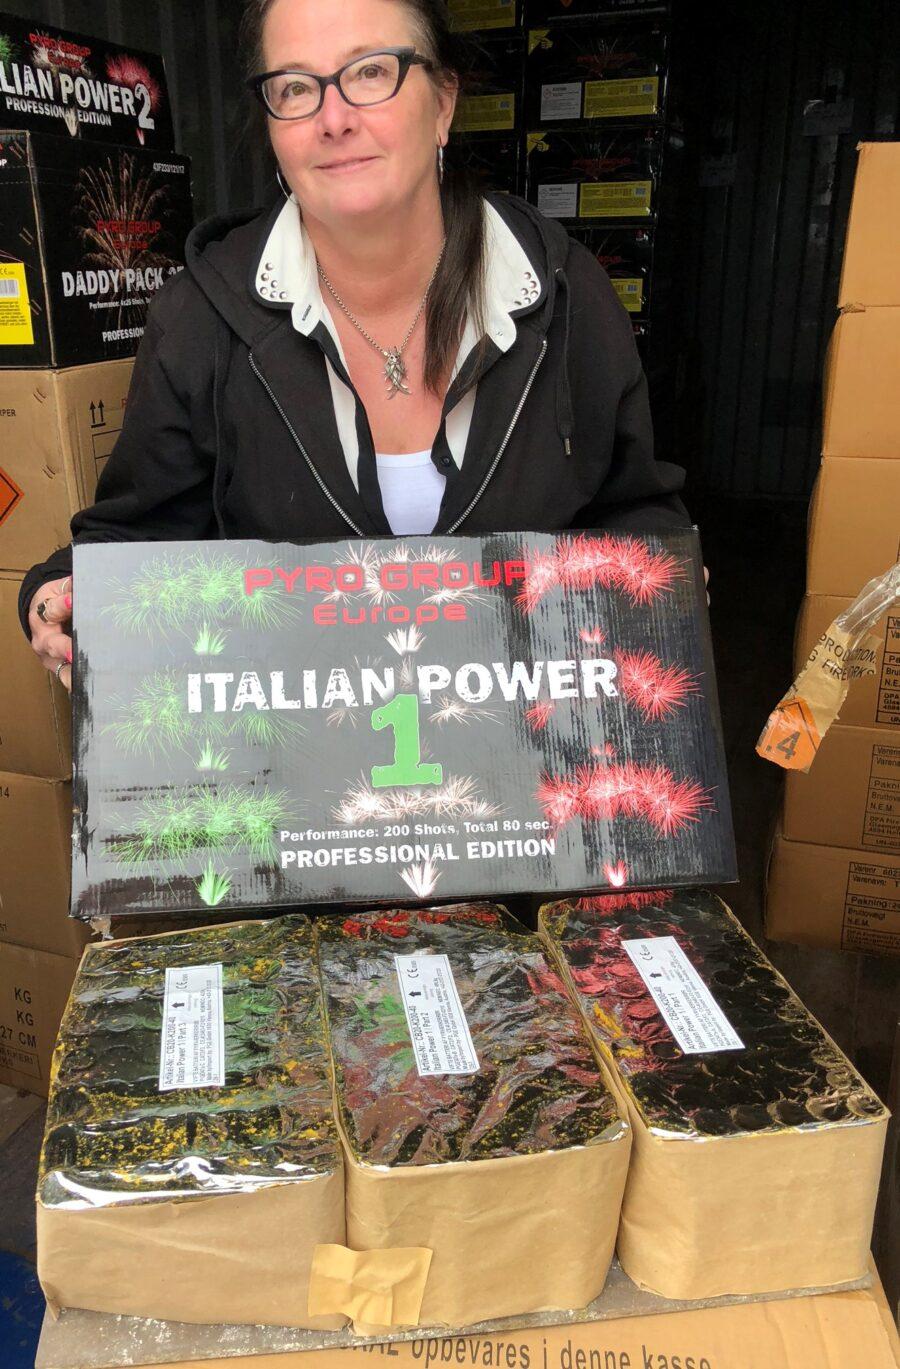 ITALIEN POWER 1